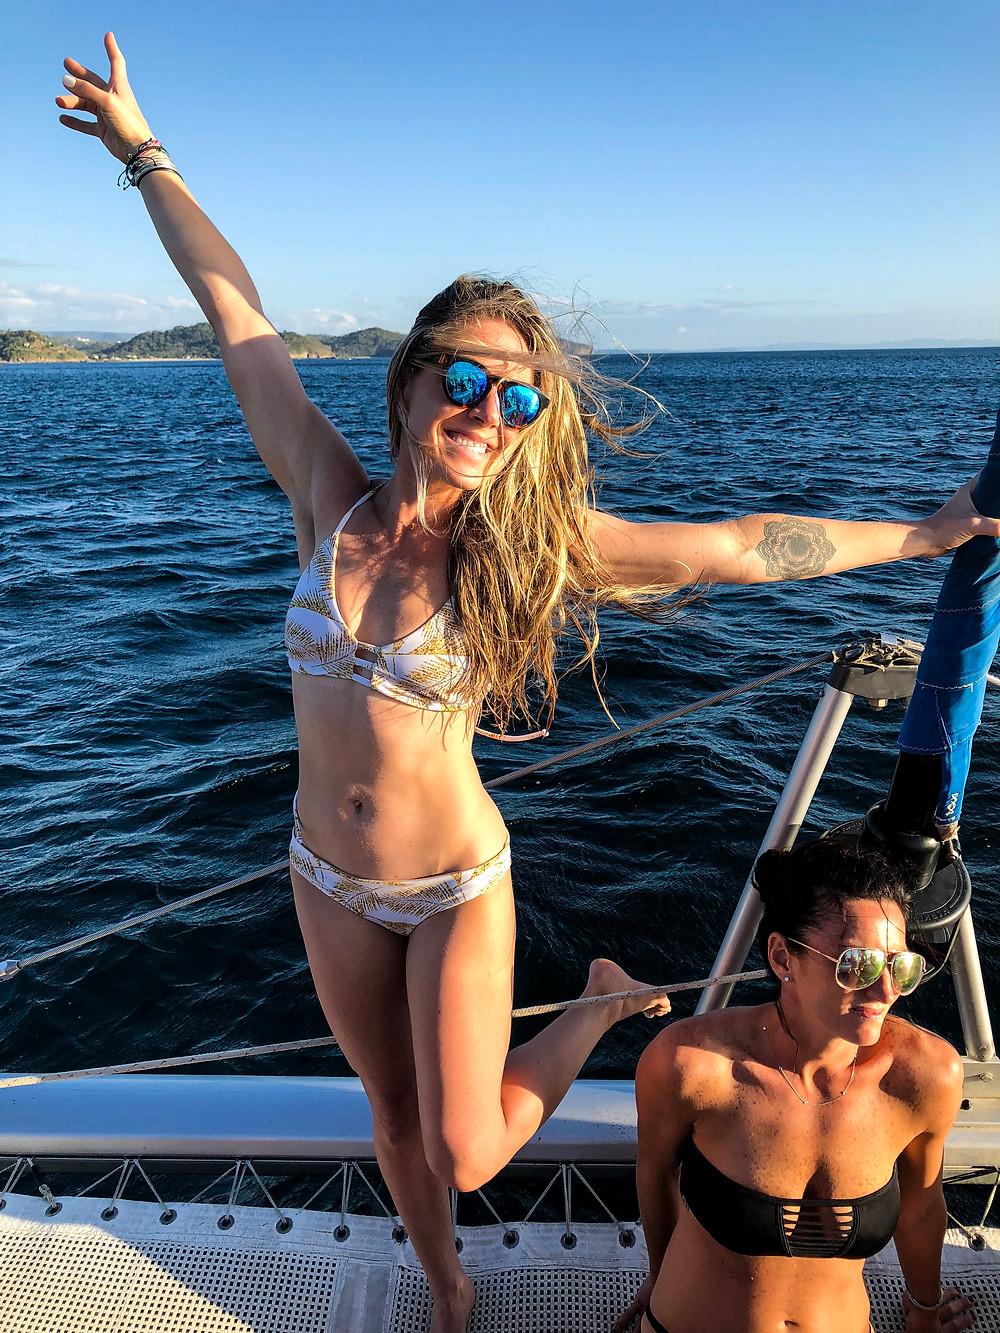 Having a blast on the catamaran trip.